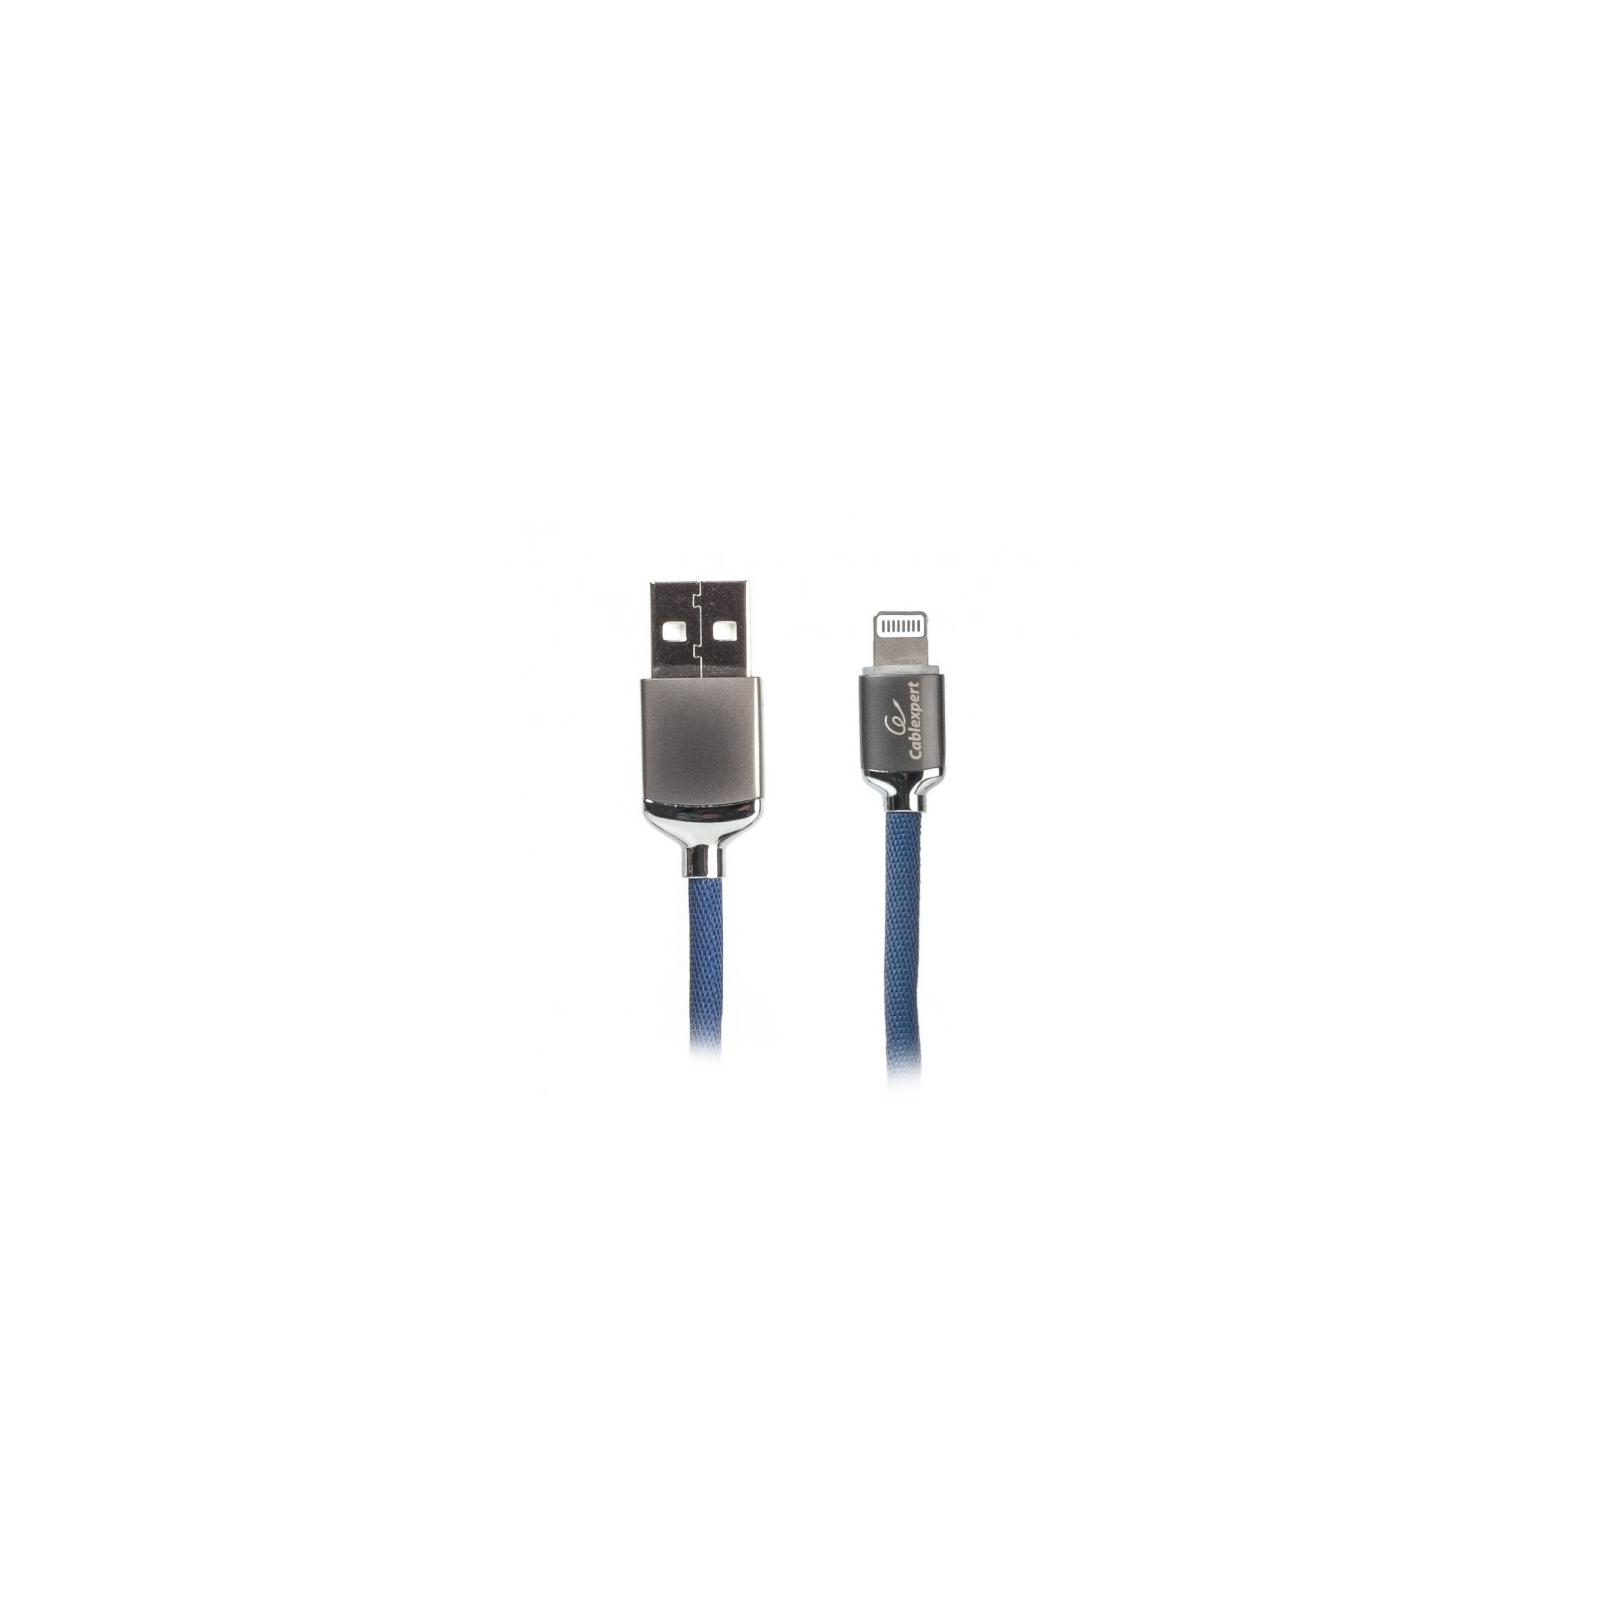 Дата кабель USB 2.0 AM to Lightning 1.0m Cablexpert (CCPB-L-USB-07B)